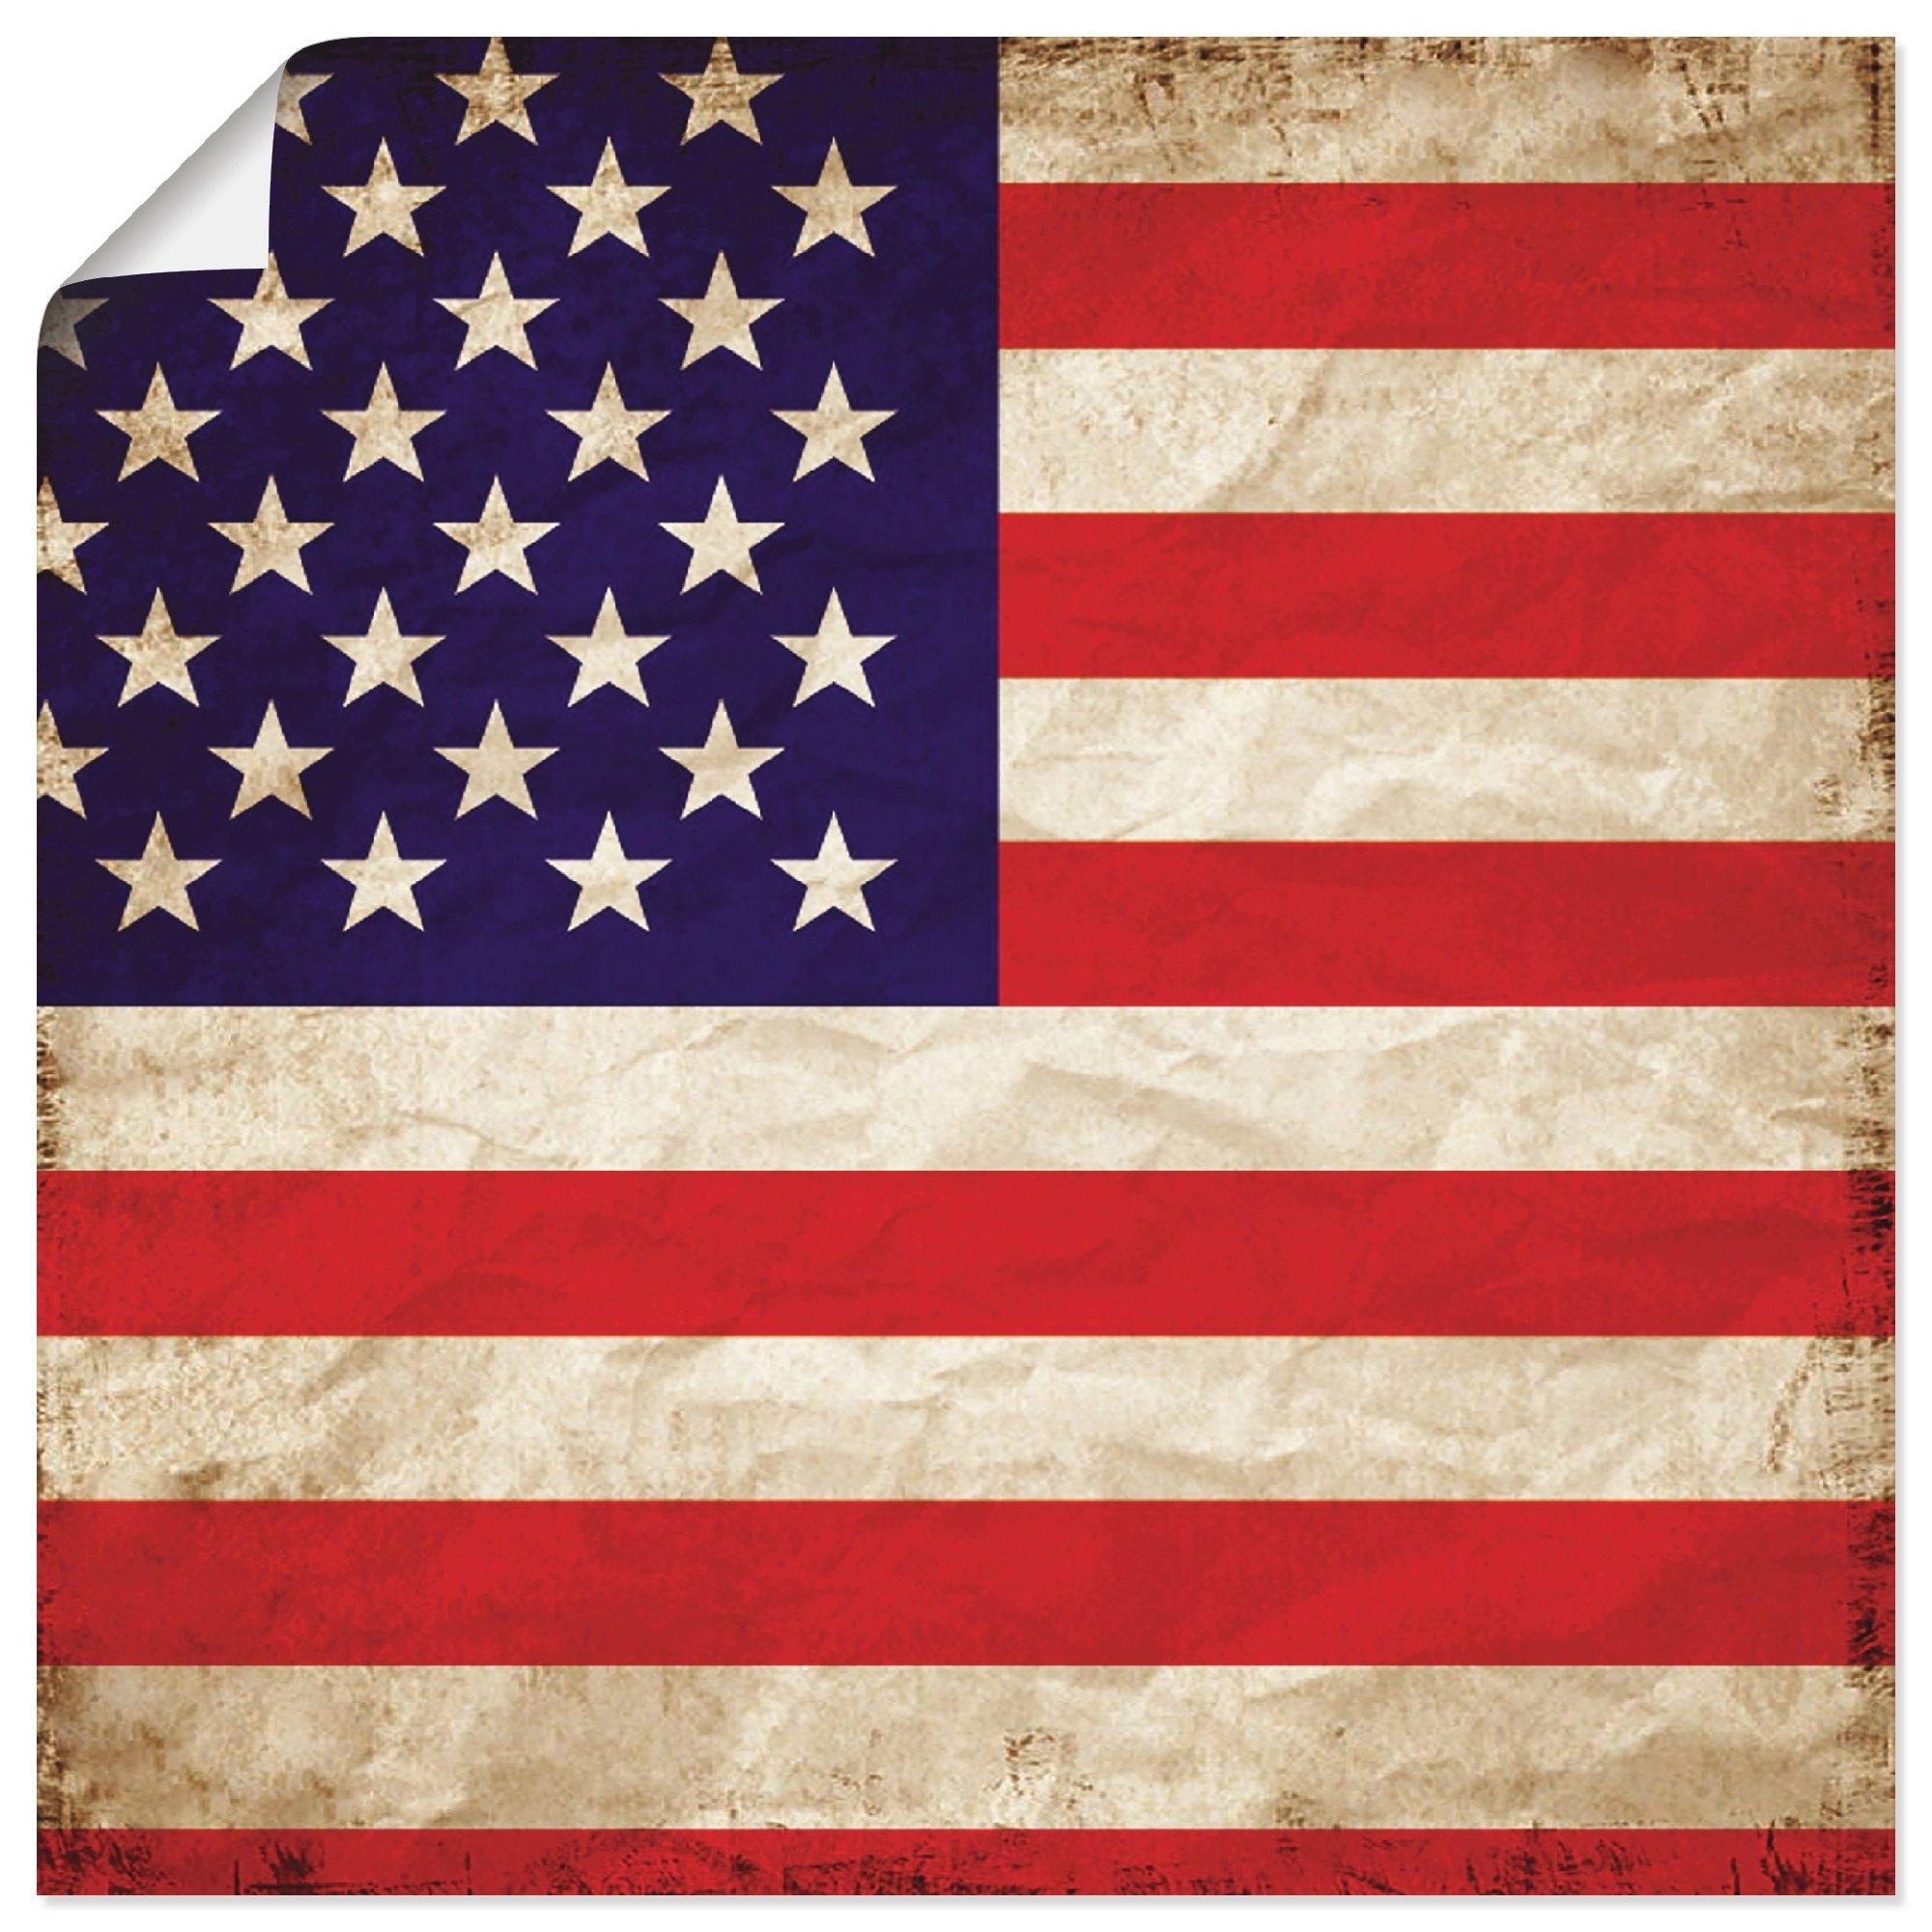 Artland artprint »USA Amerikanische Flagge« - verschillende betaalmethodes